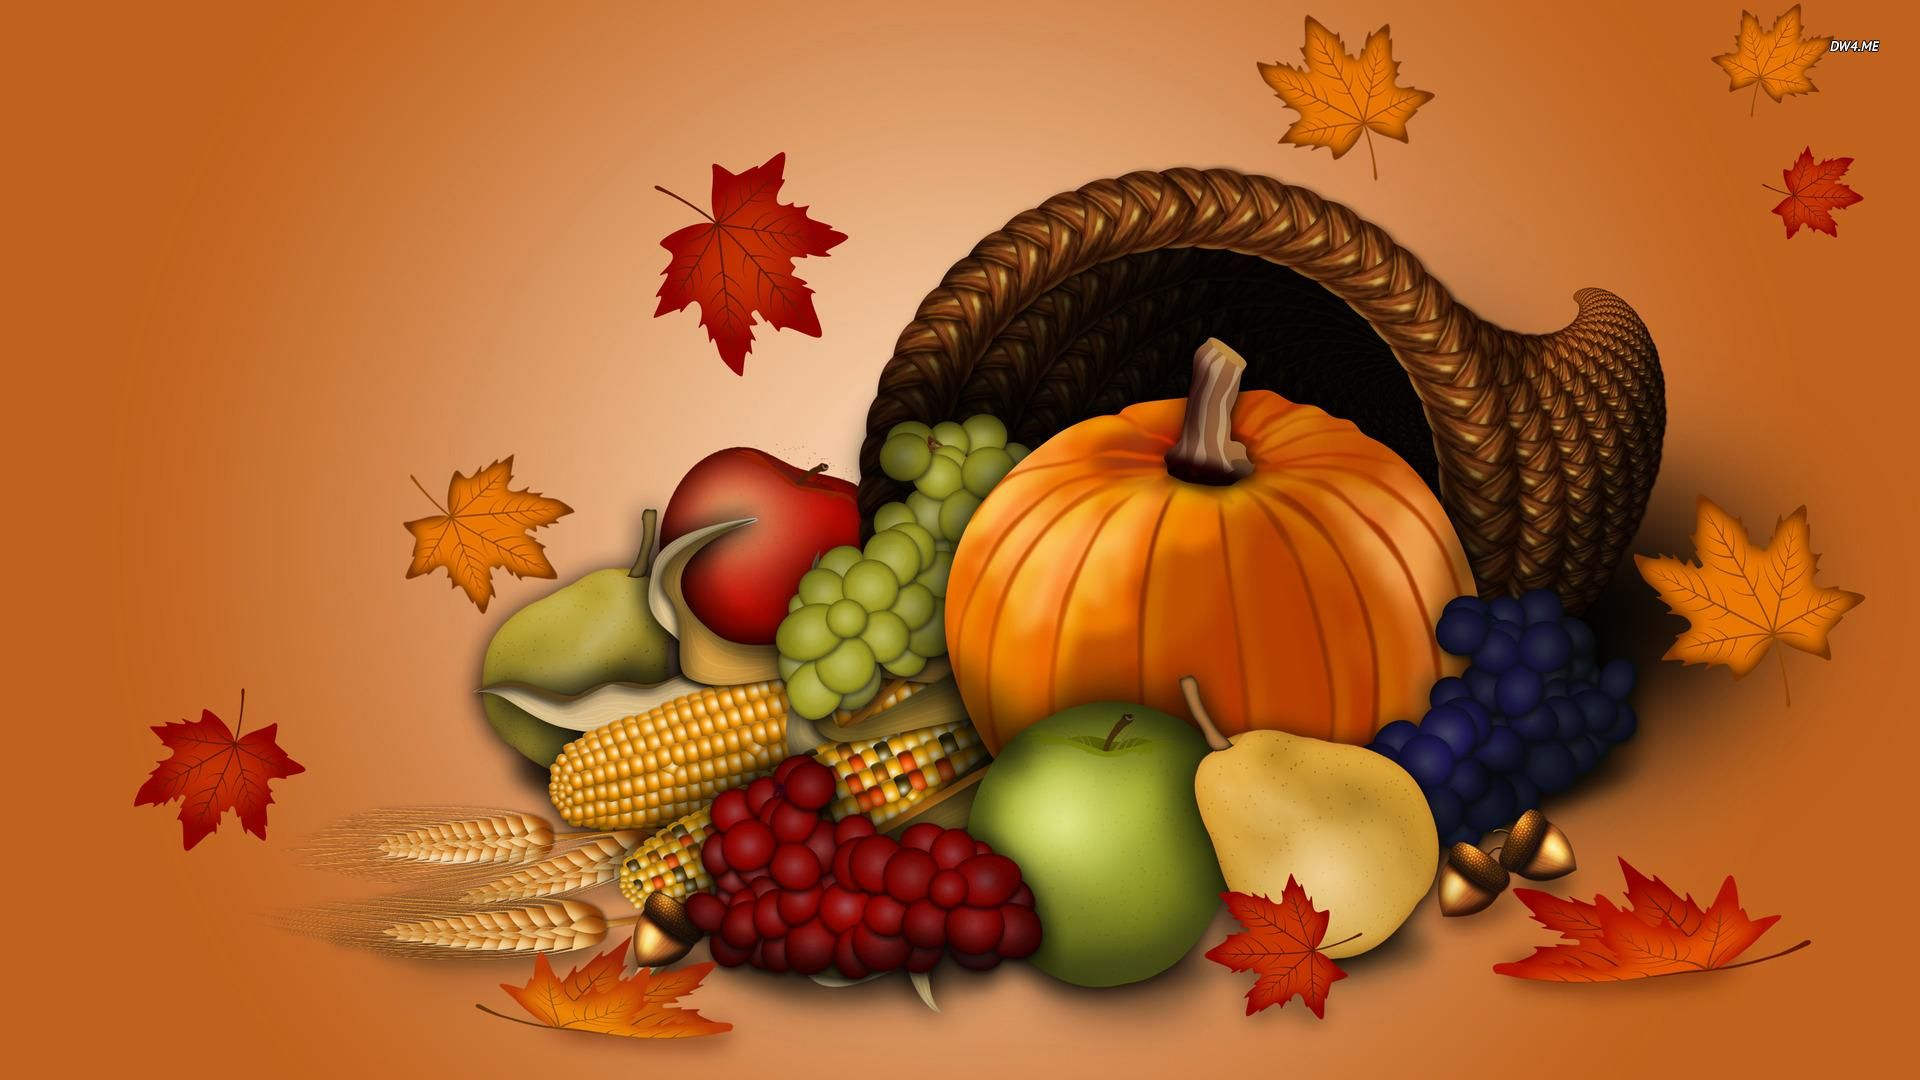 Wallpaper for My Desktop Thanksgiving 1920×1200